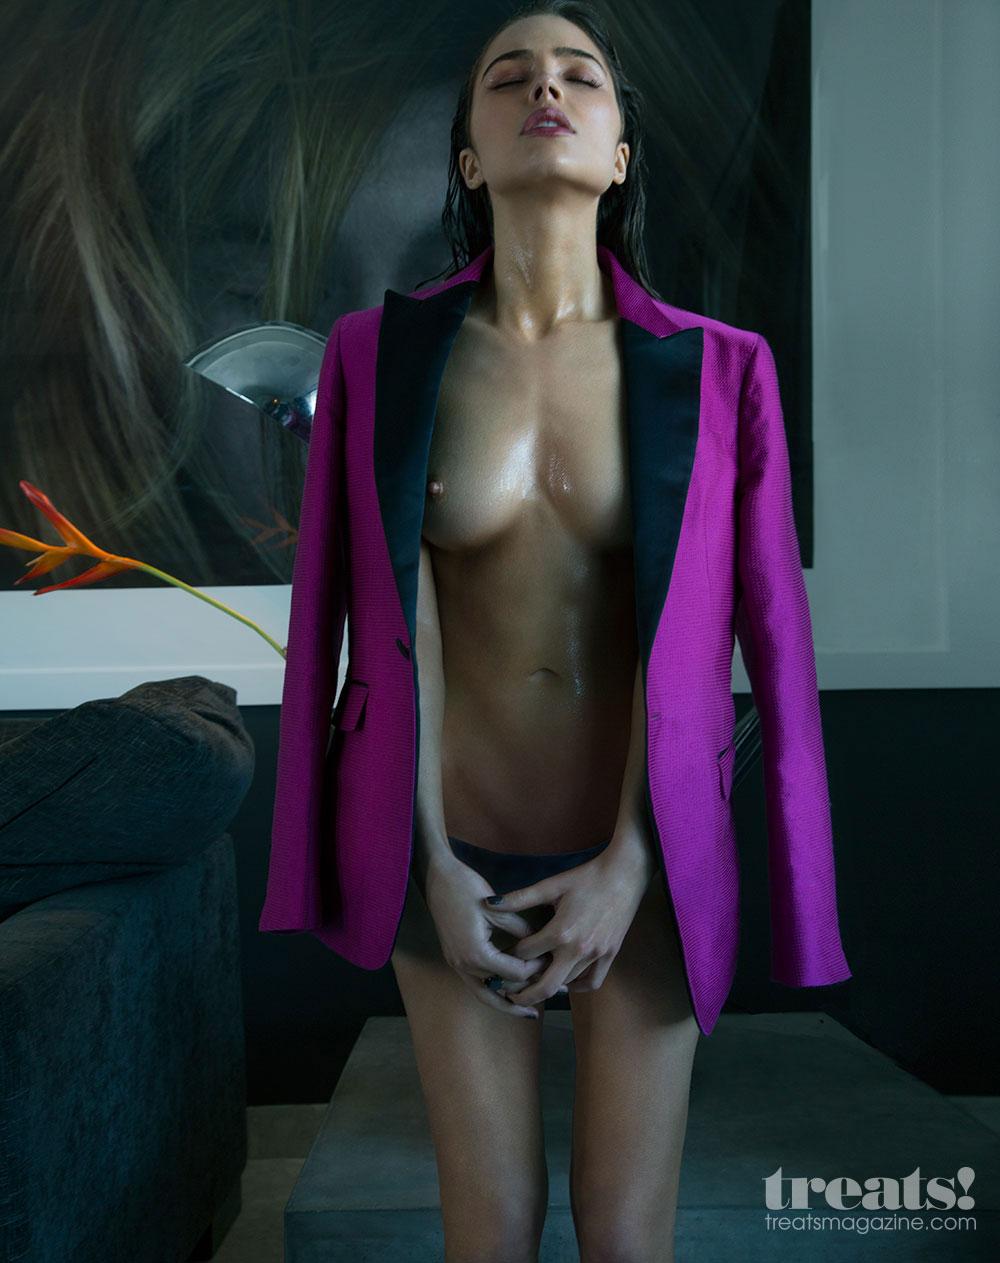 topless girl